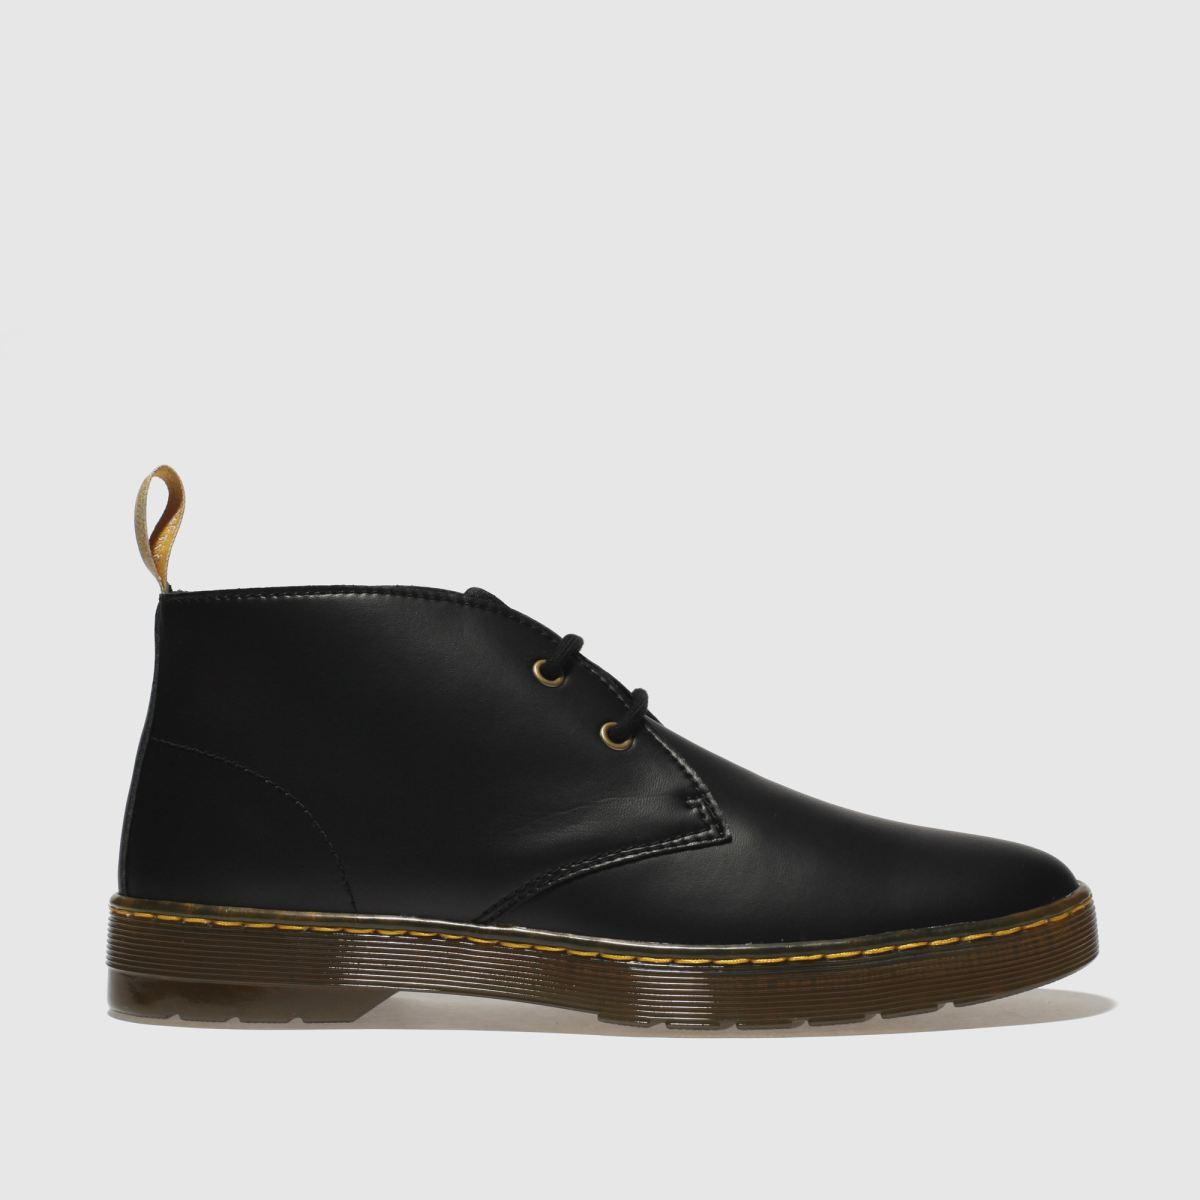 Dr Martens Black Cabrillo Vegan Boots